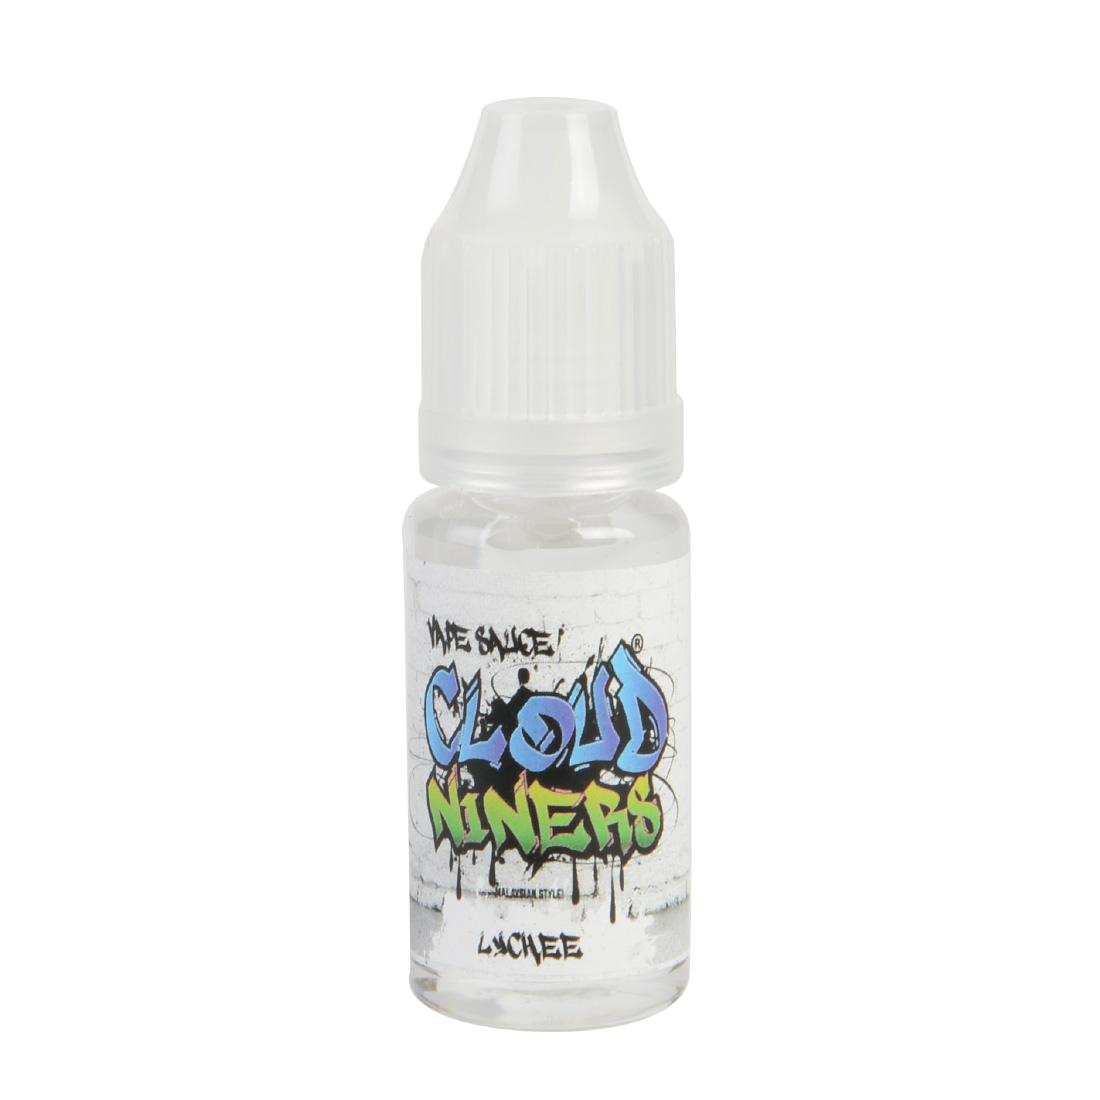 E liquide cloud niners